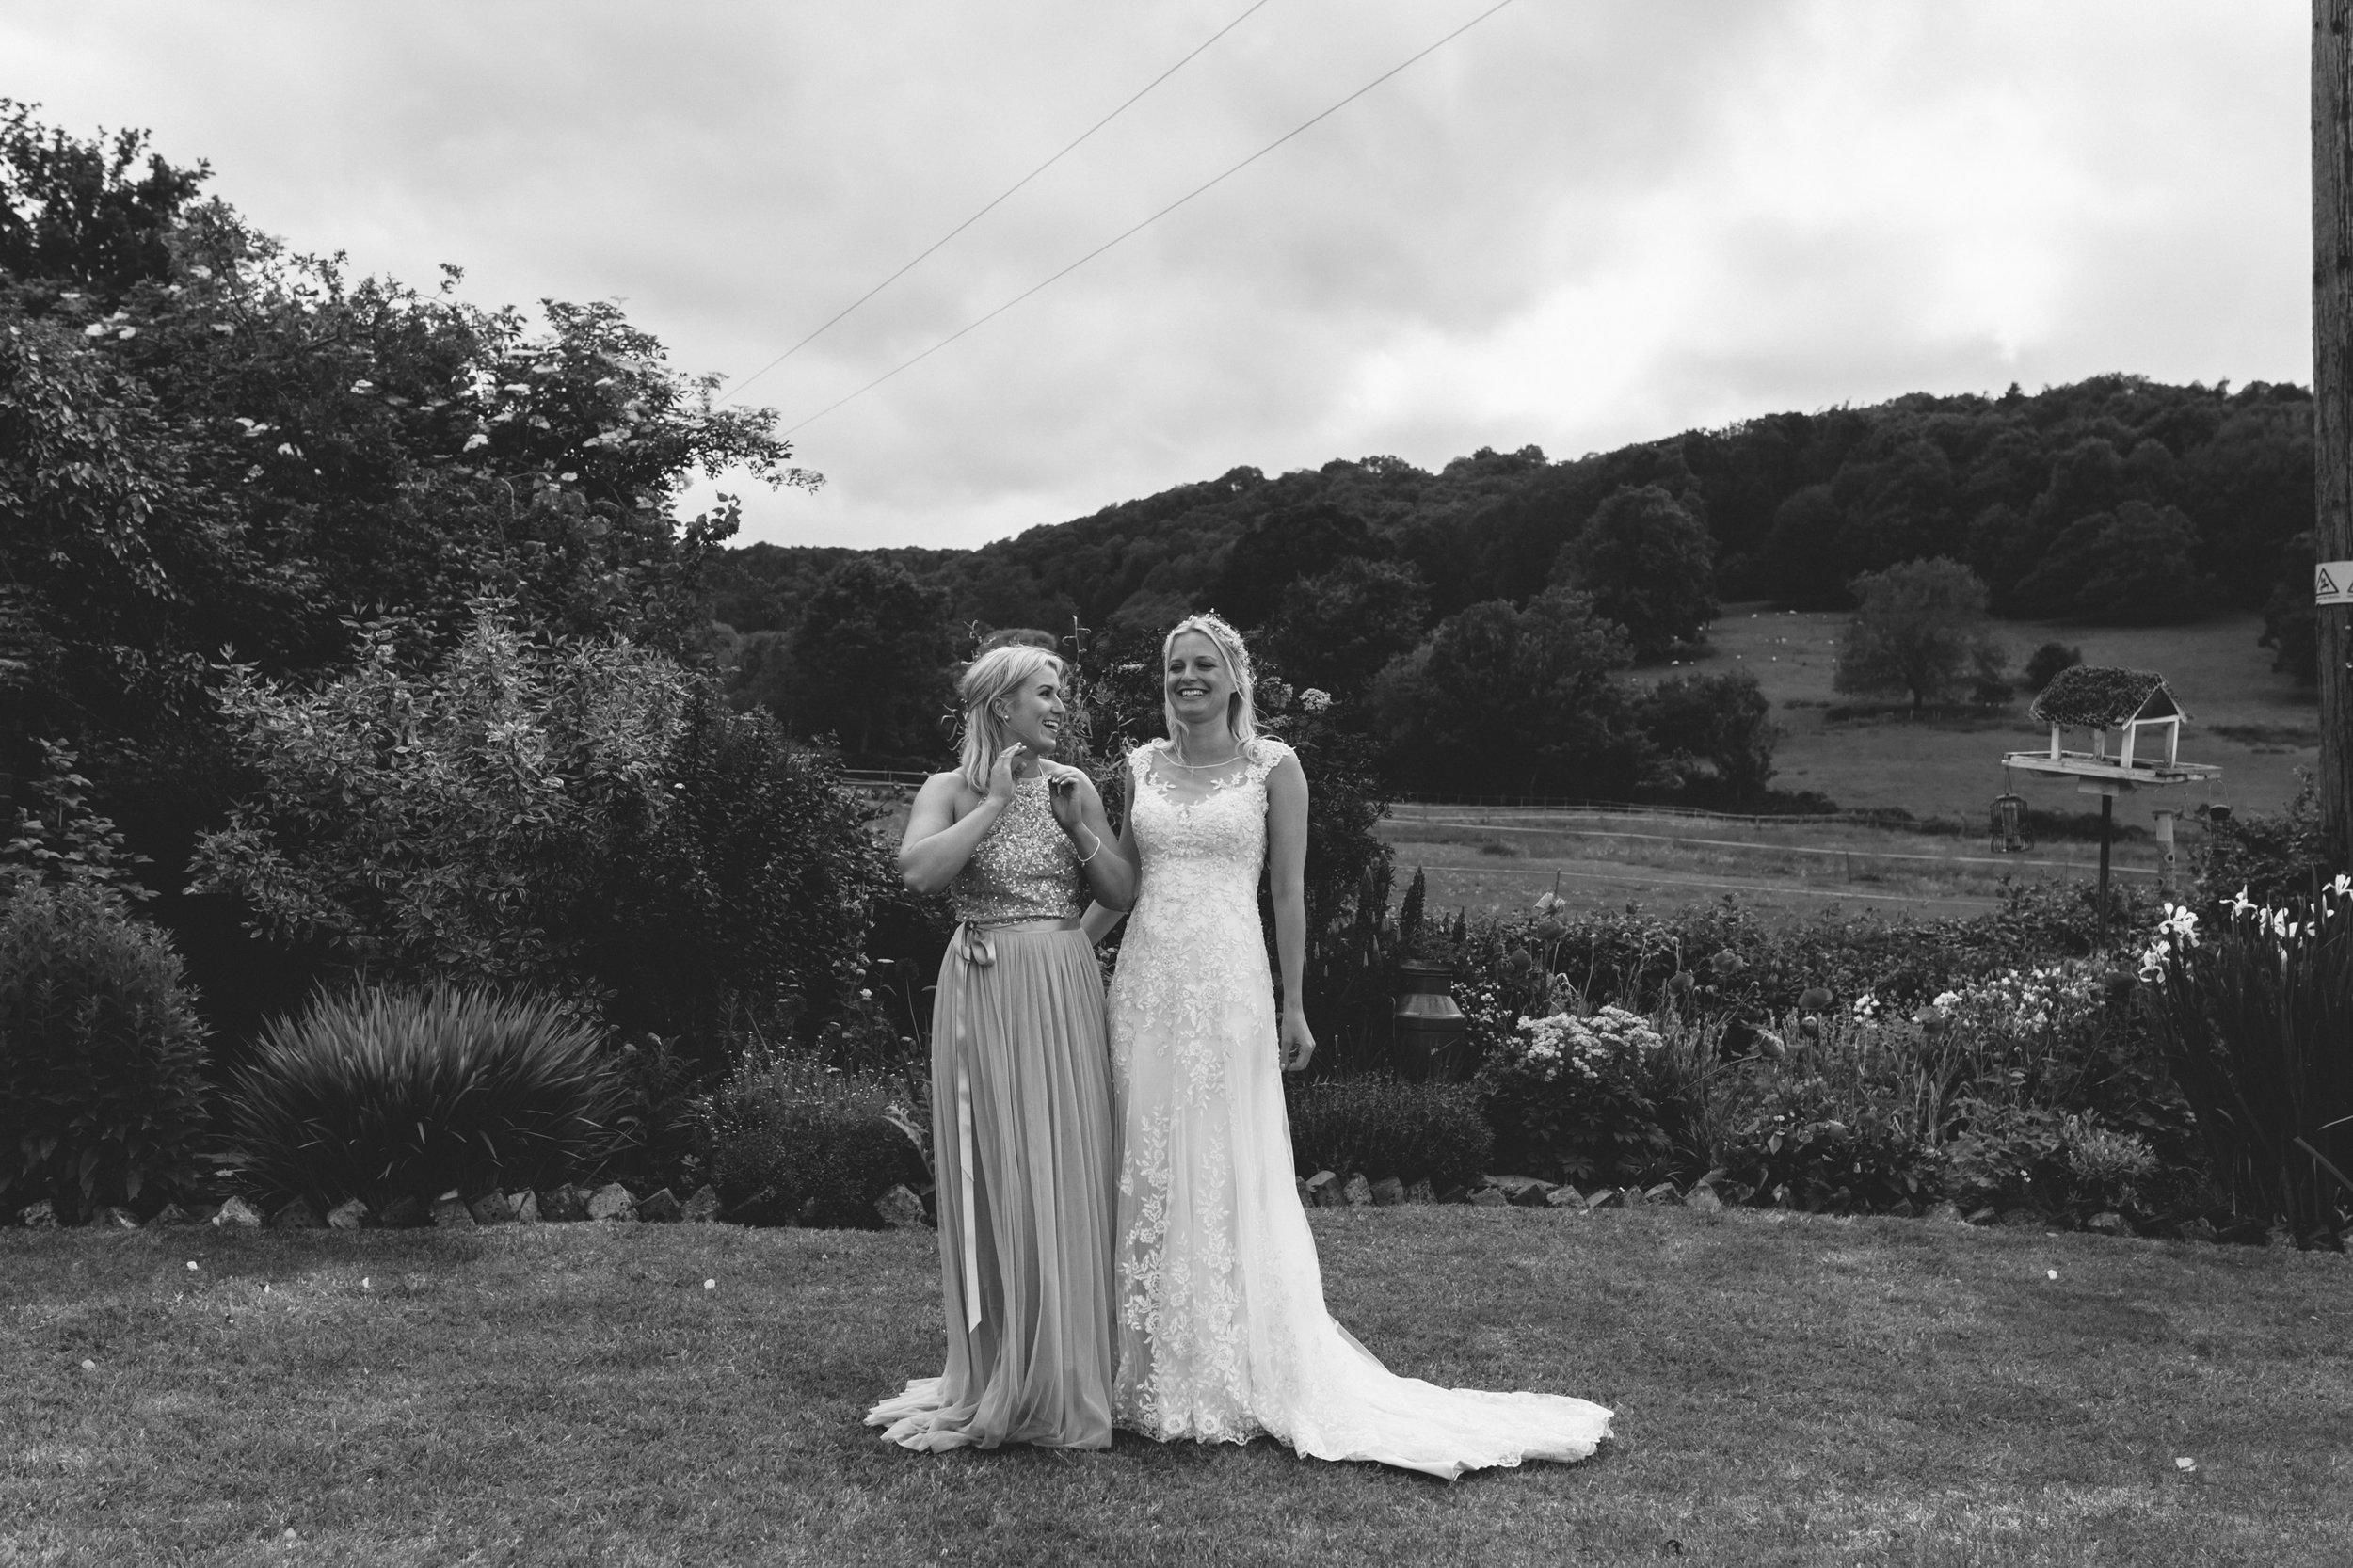 bridesmaids Birmingham photographer wedding country artistic wedding photography44.jpg